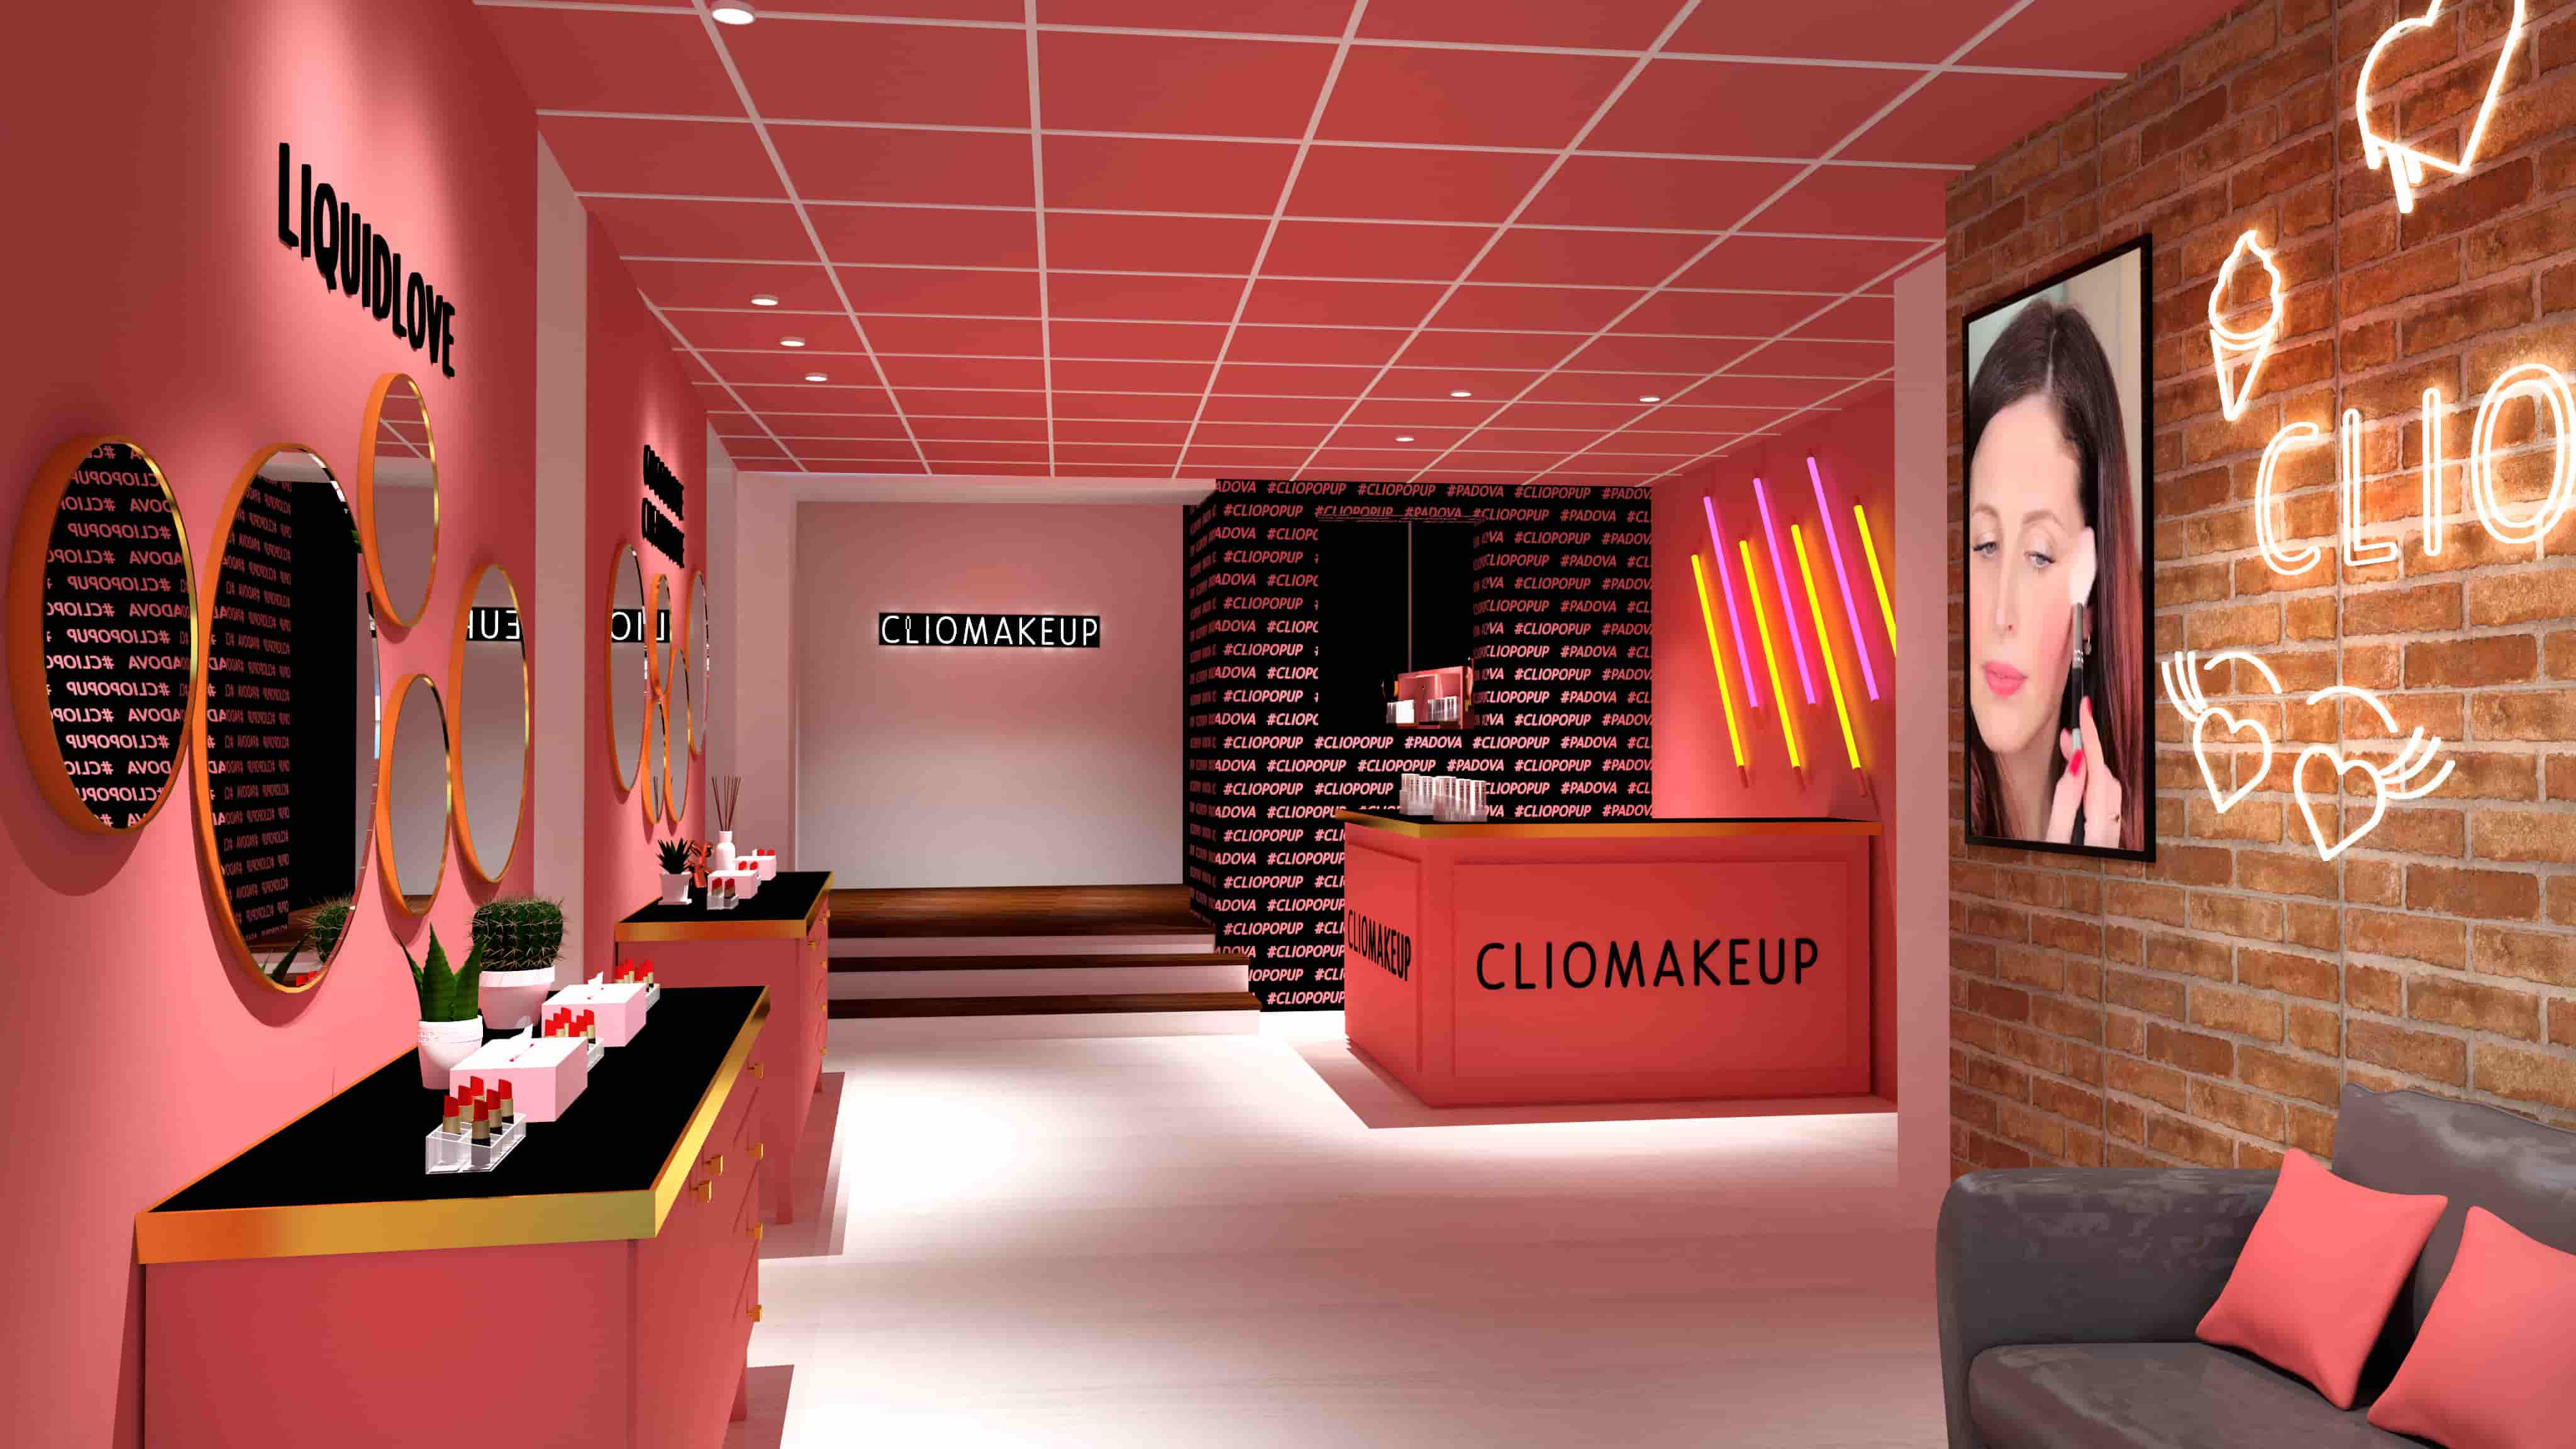 Cliomakeup-cliopopup-padova